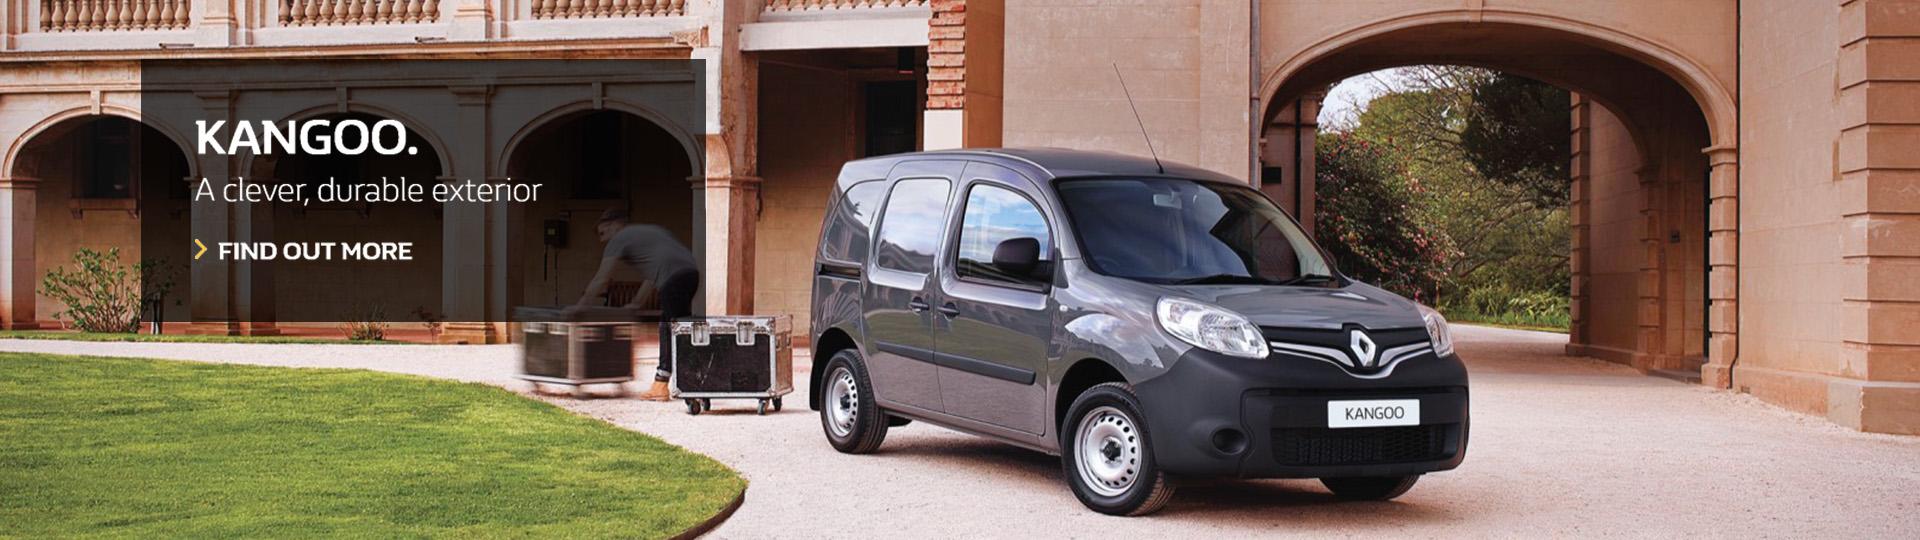 Renault Kangoo - A clever, durable exterior